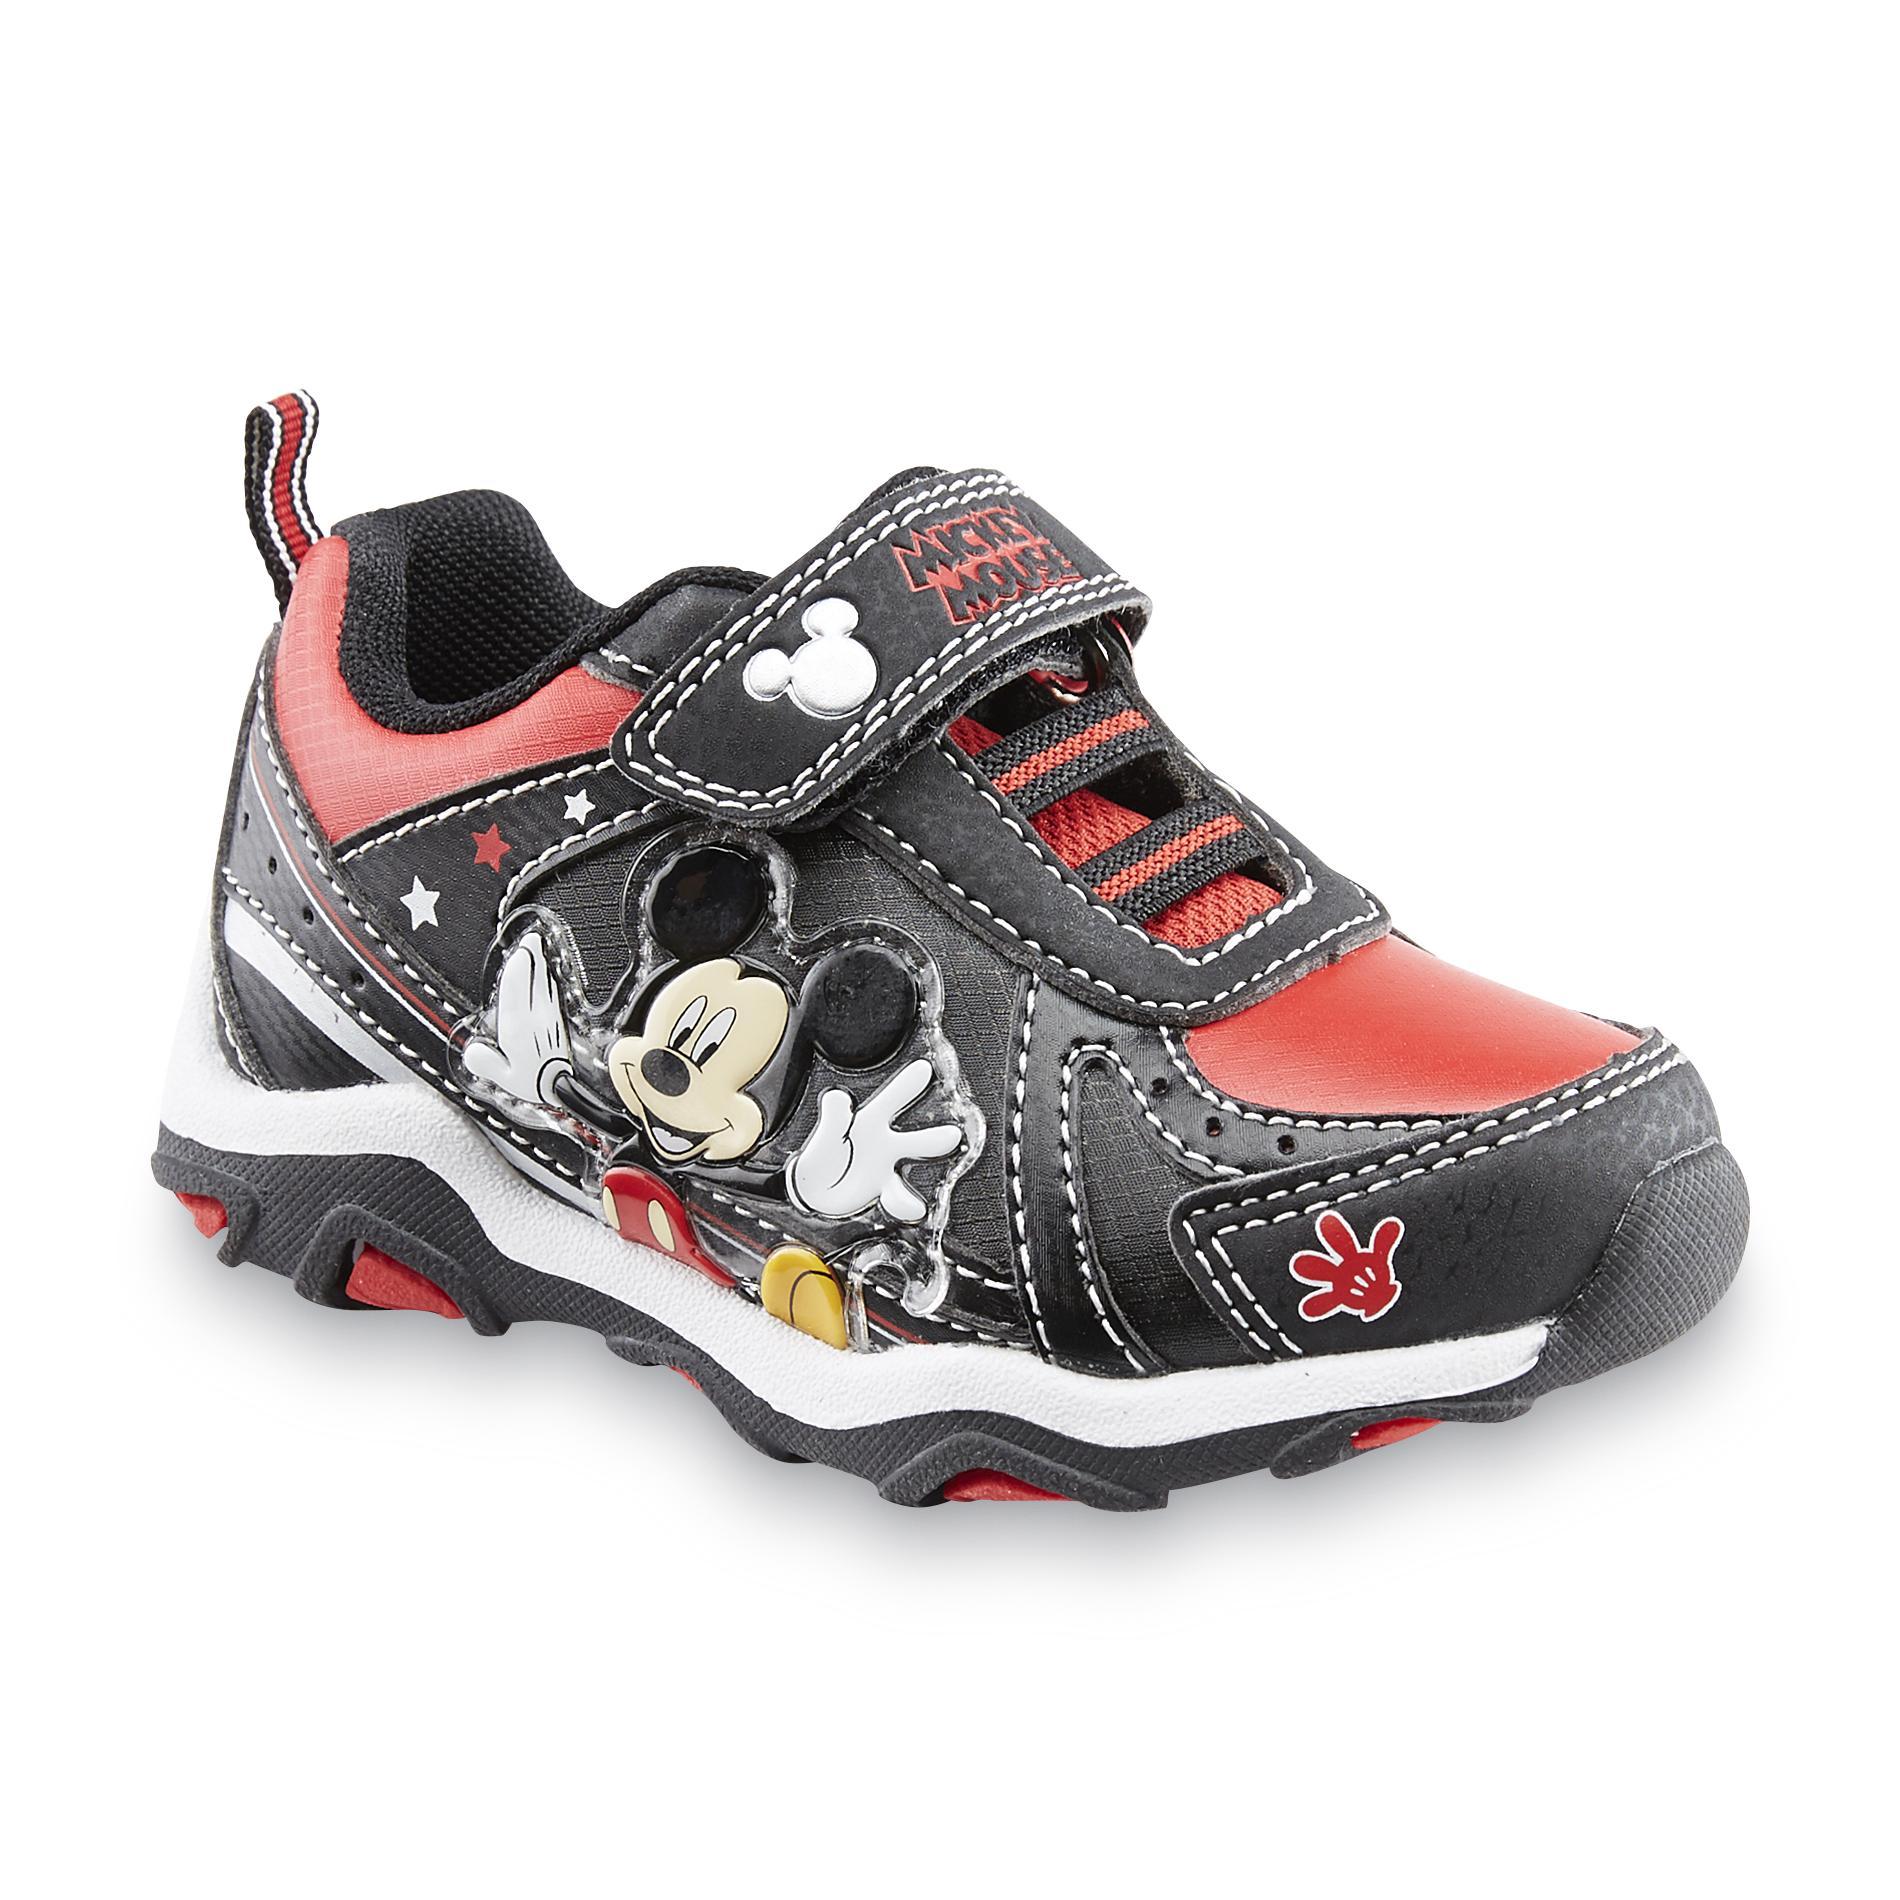 Disney Toddler Boys Mickey Mouse BlackRed Sneaker